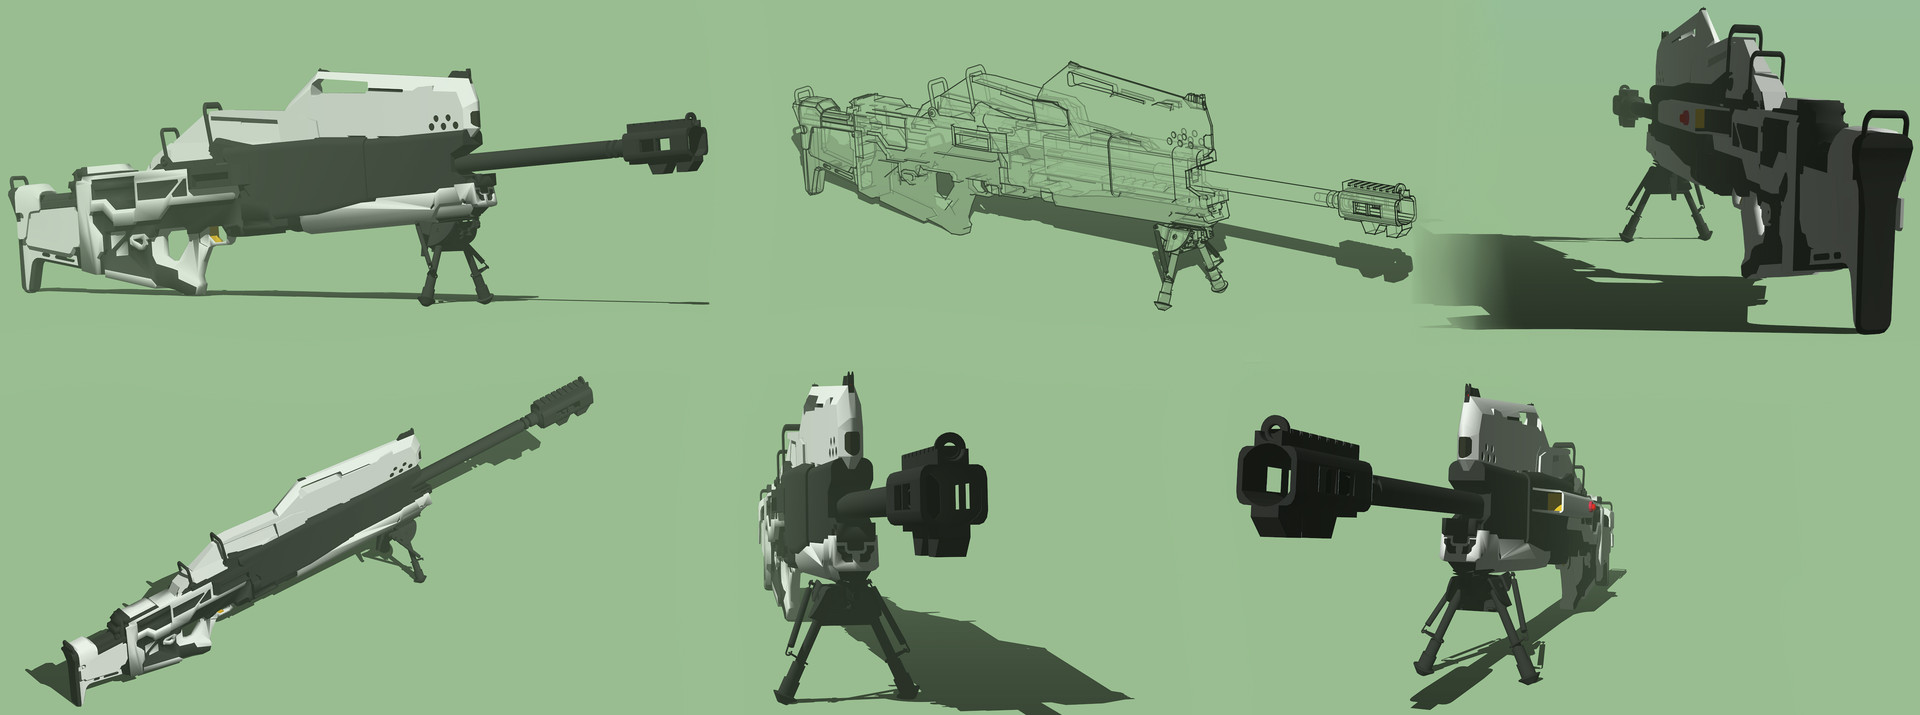 Cristian bruno lai type rail sniper